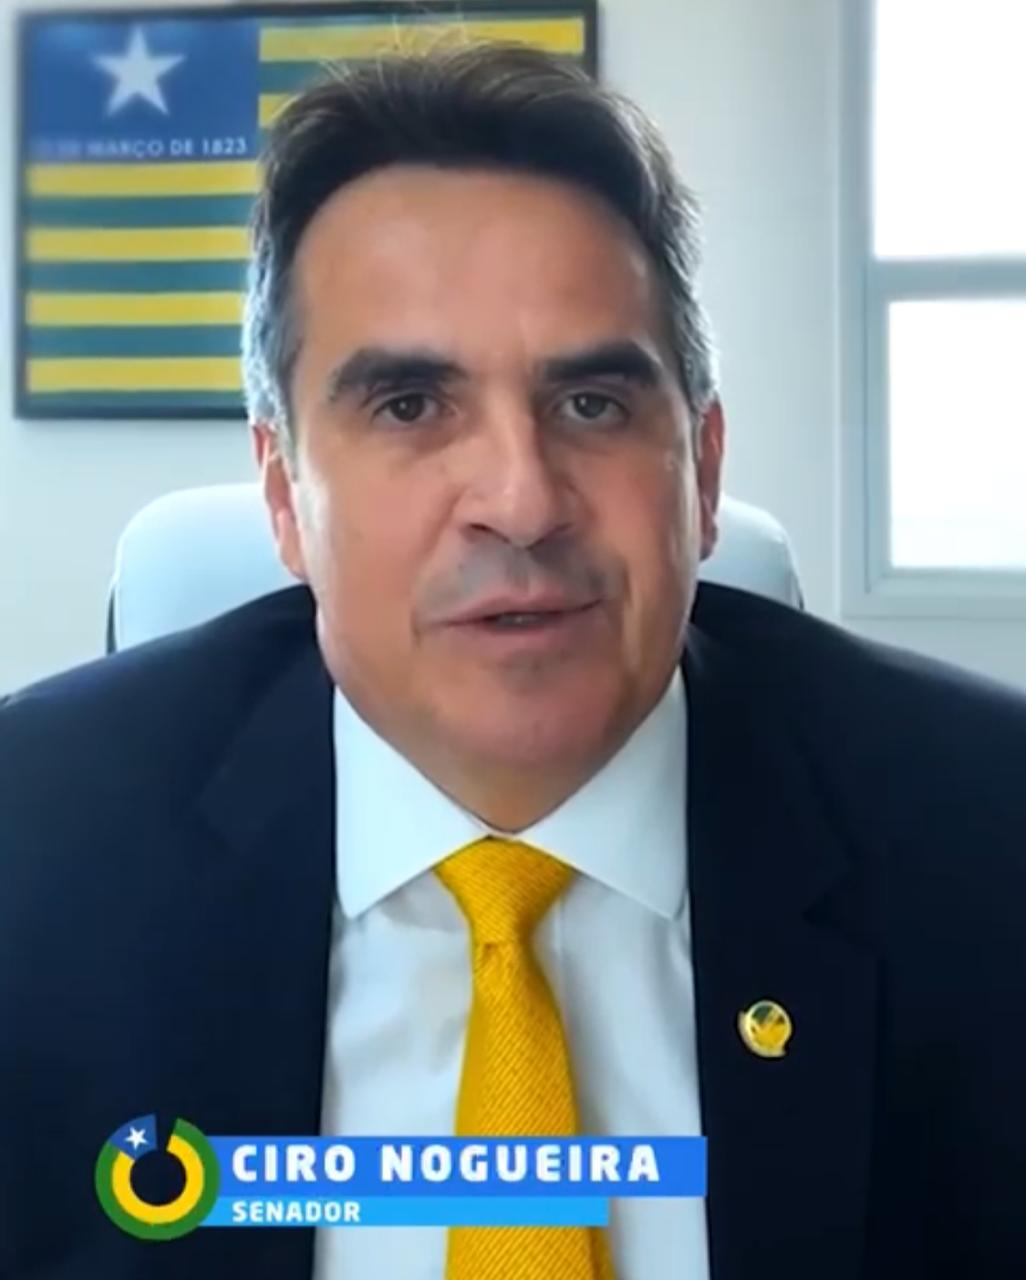 Senador Ciro Nogueira (Progressistas) fala sobre economia do Piauí